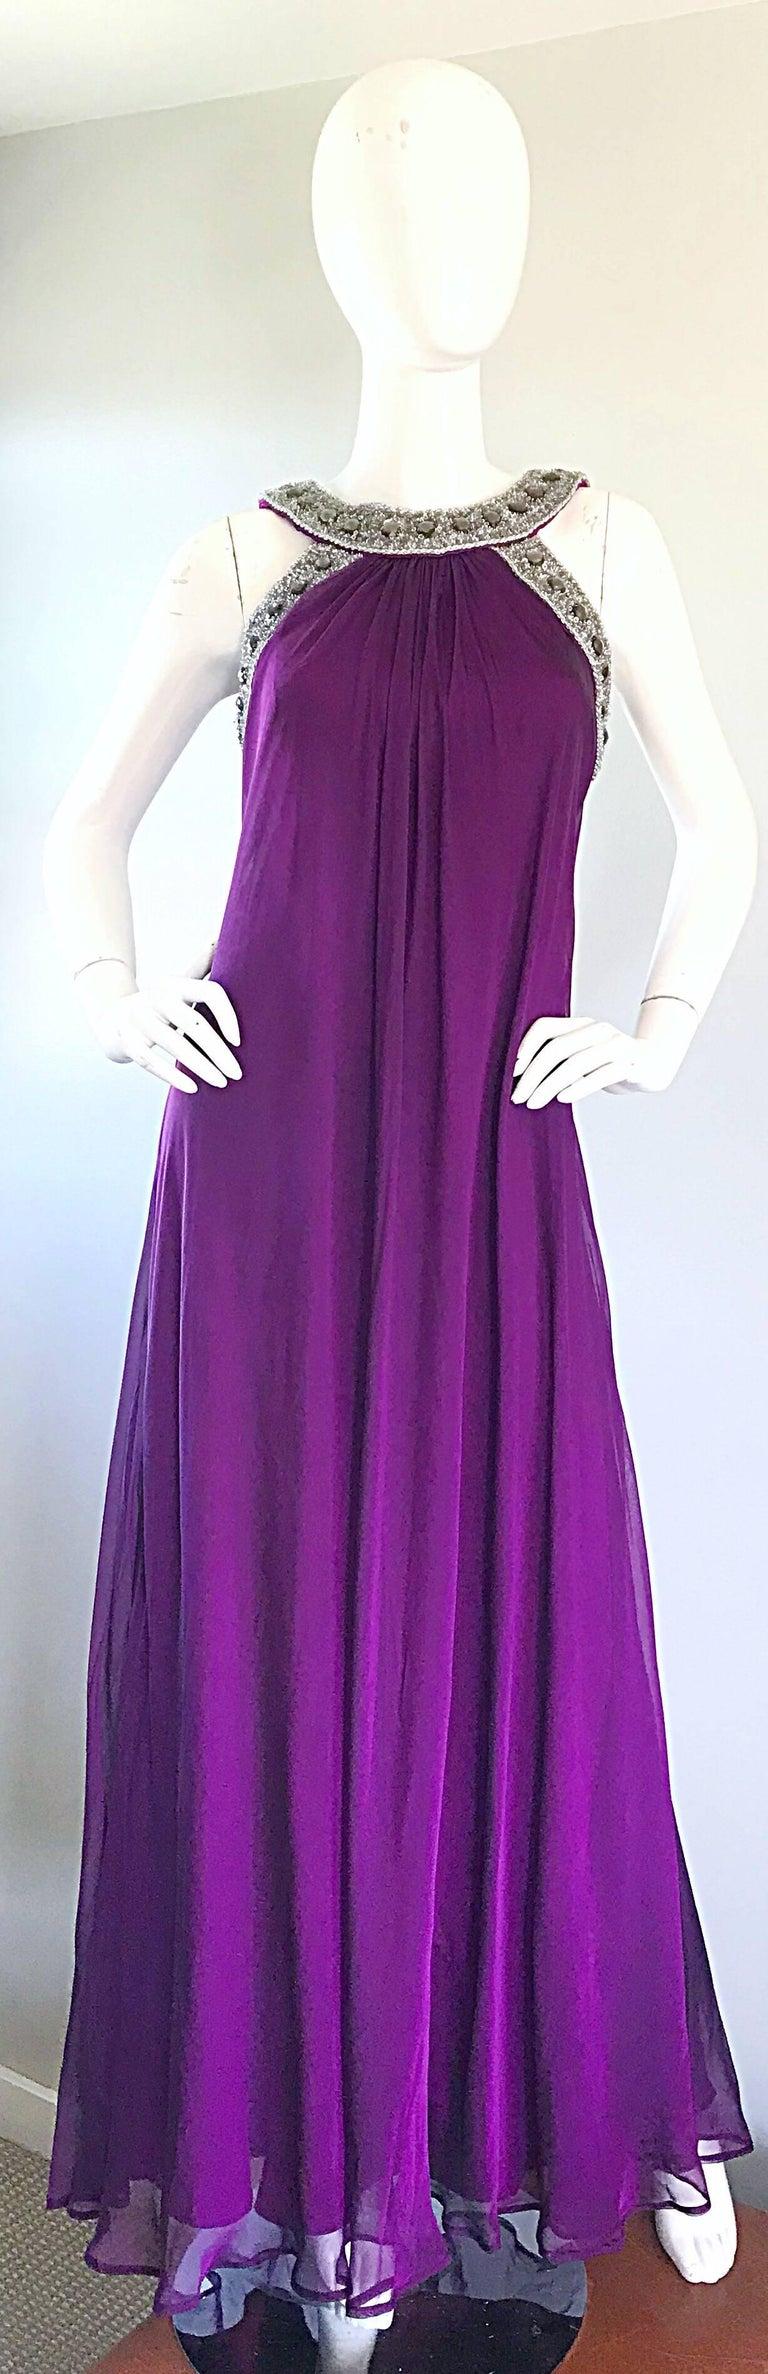 1990s Badgley Mischka Sz 4 6 Purple Silk Chiffon Rhinestone Vintage Grecian Gown For Sale 5